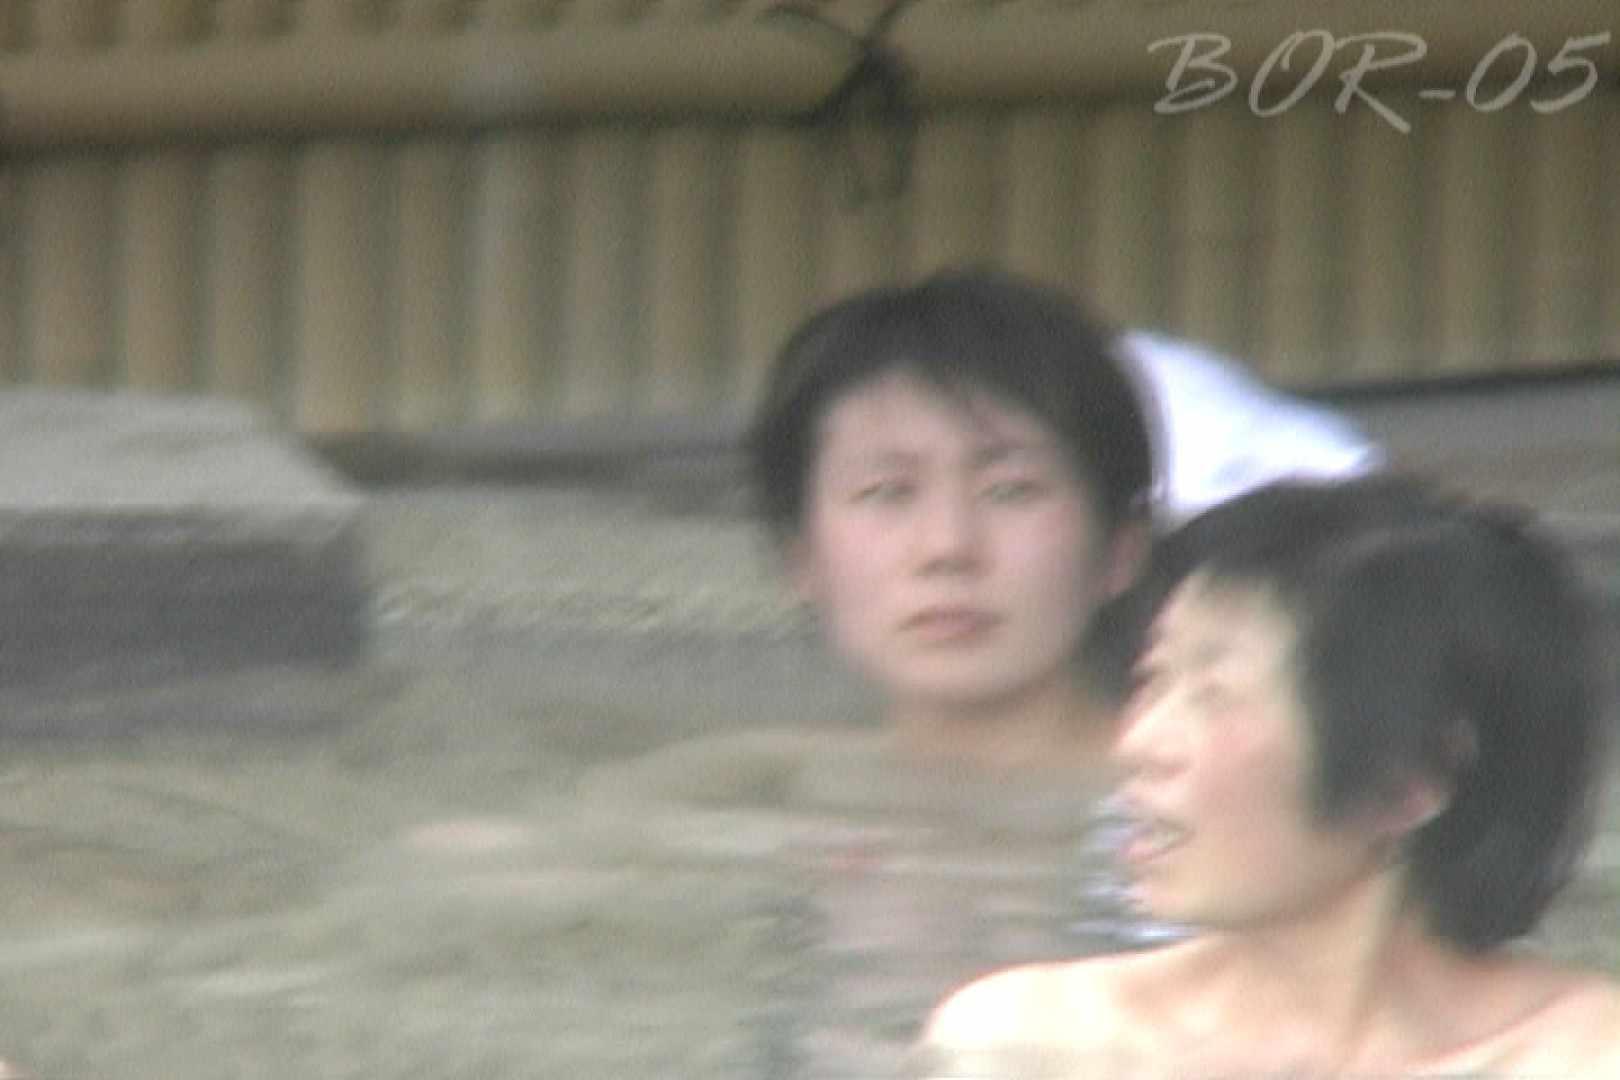 Aquaな露天風呂Vol.493 盗撮 AV無料動画キャプチャ 67PICs 62